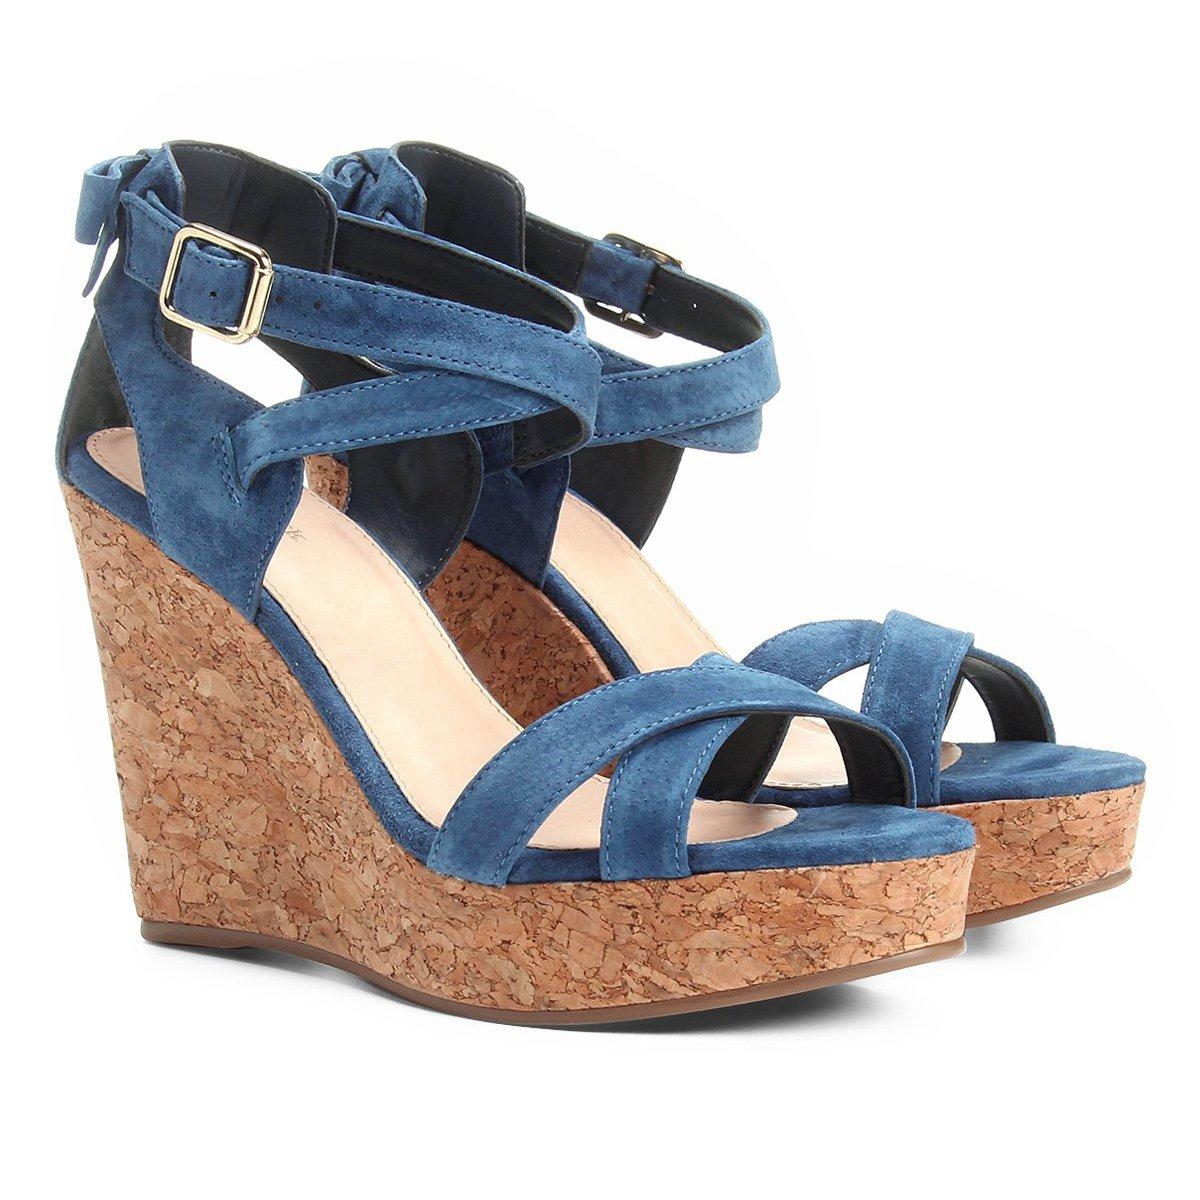 4f8082aa3 Sandália Plataforma Couro Shoestock Laço Feminina | Shoestock